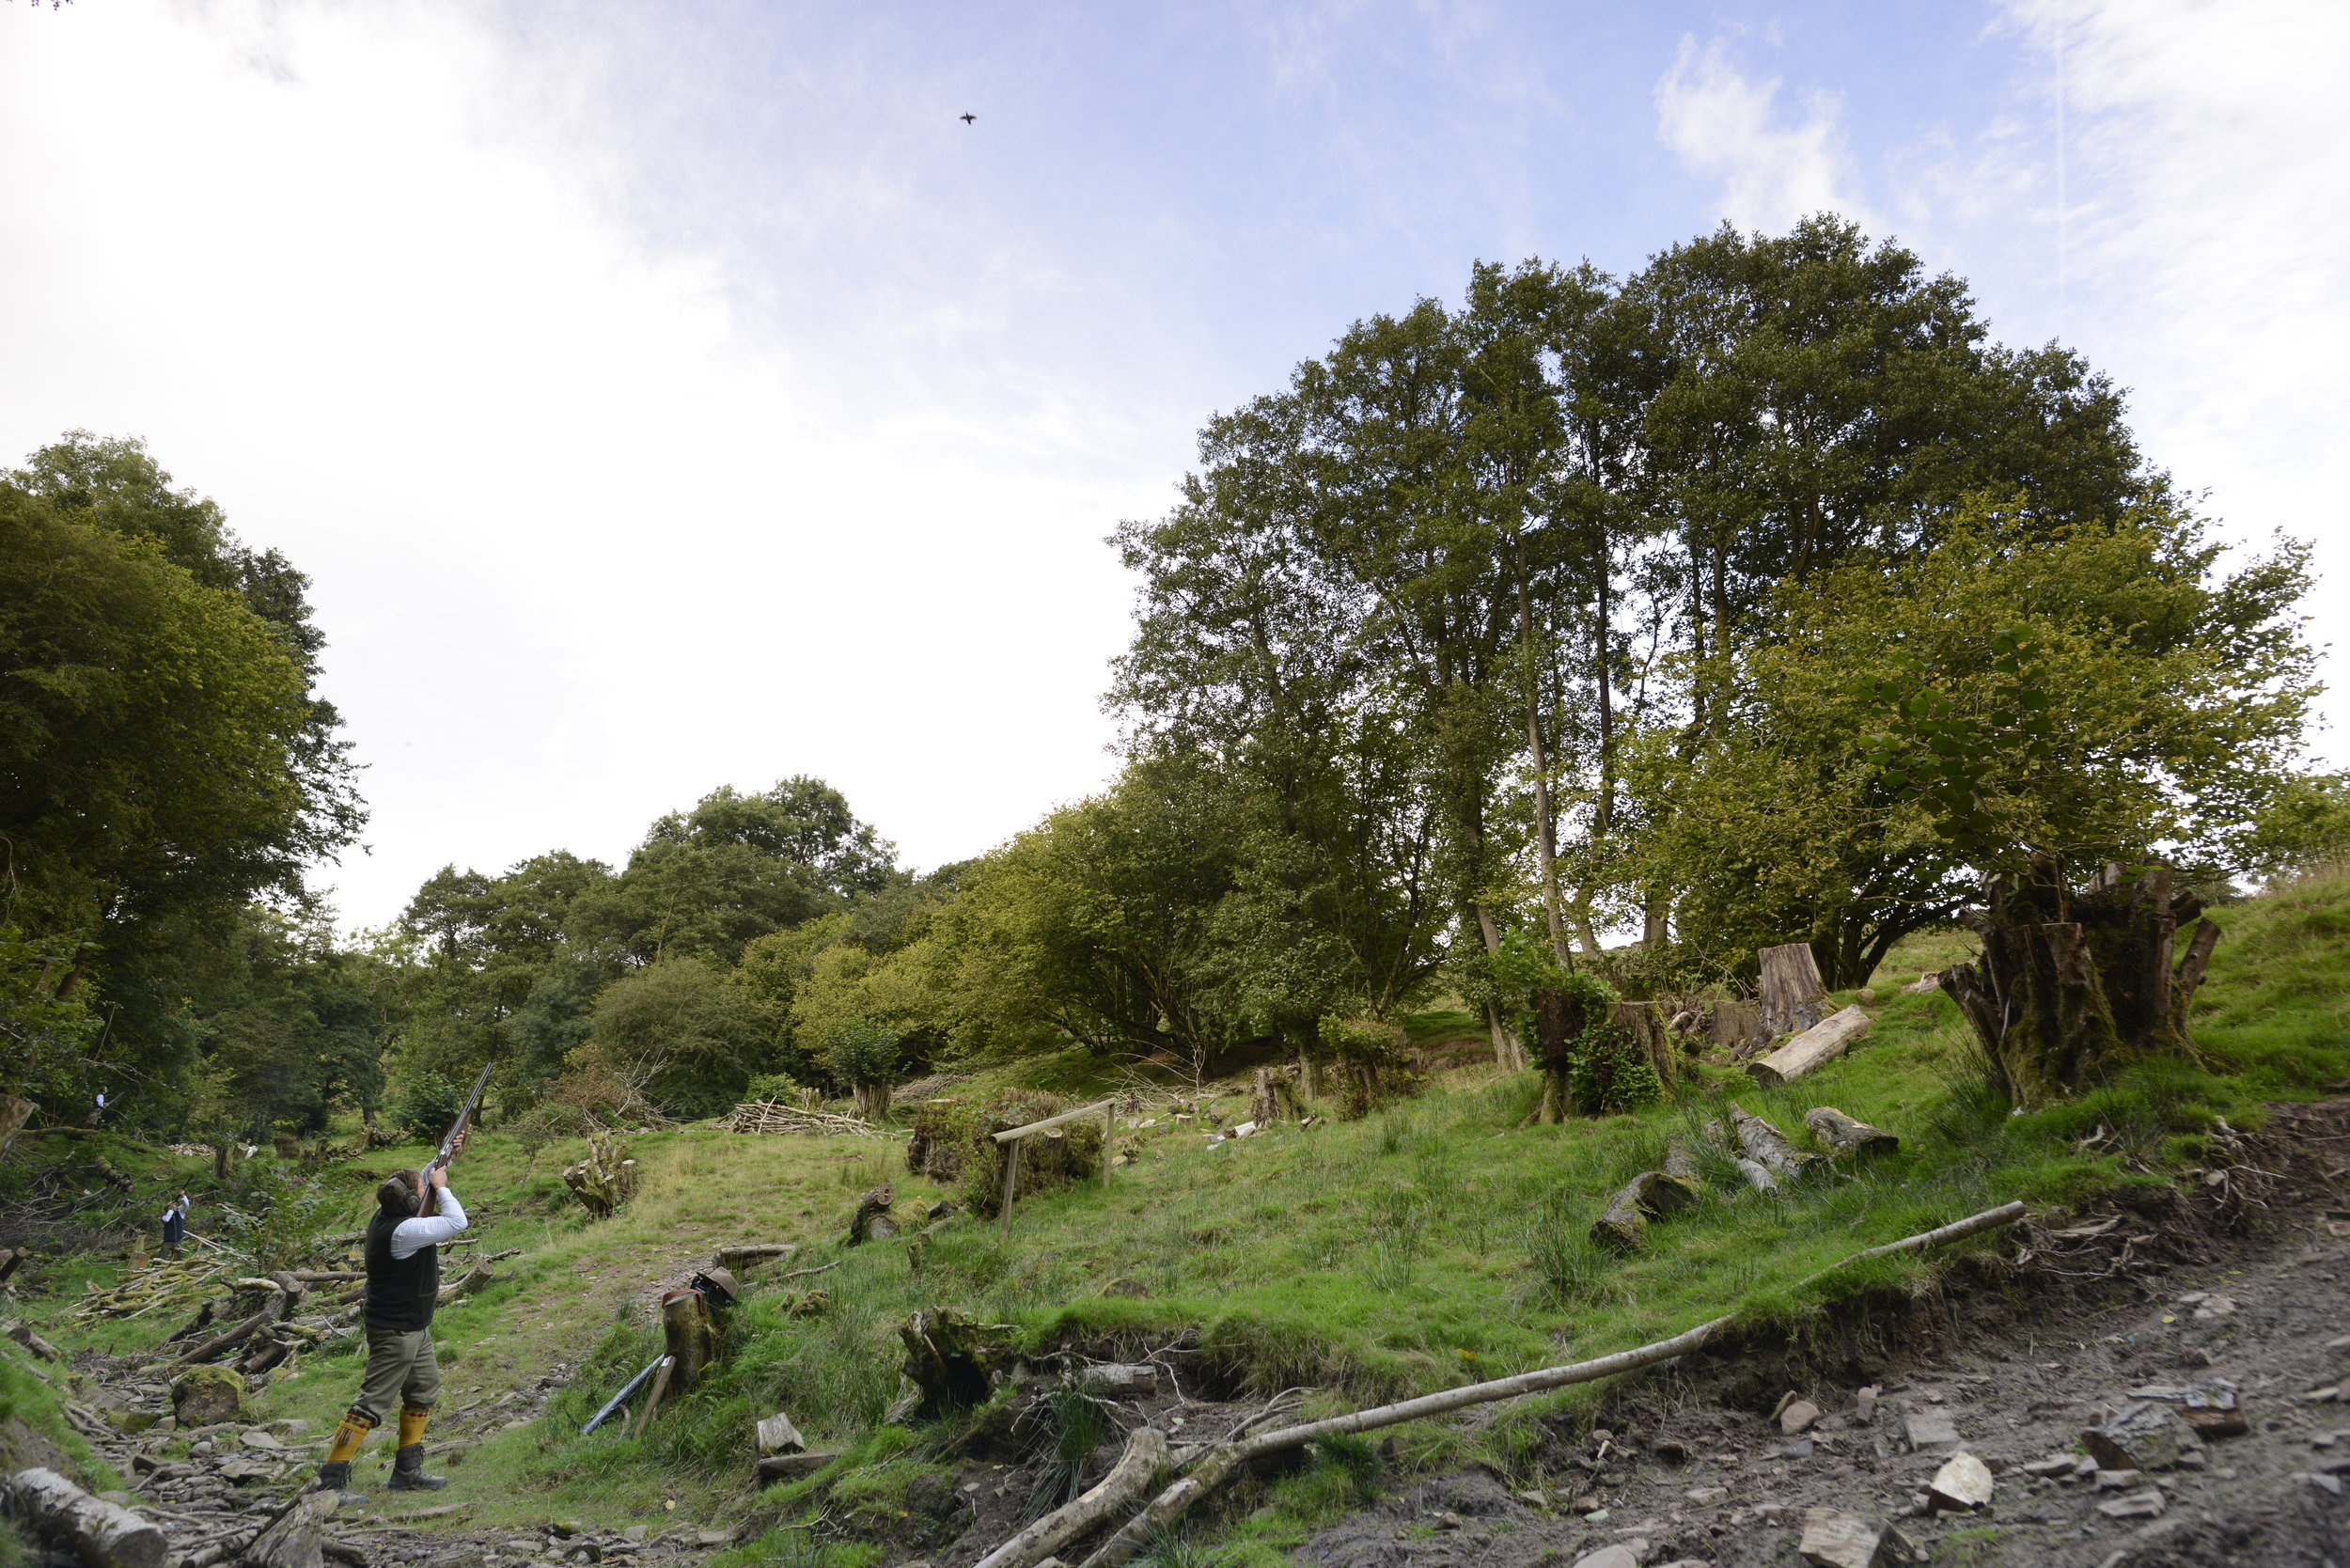 September Partridge Shooting at Tregoyd - Hardwick Sporting